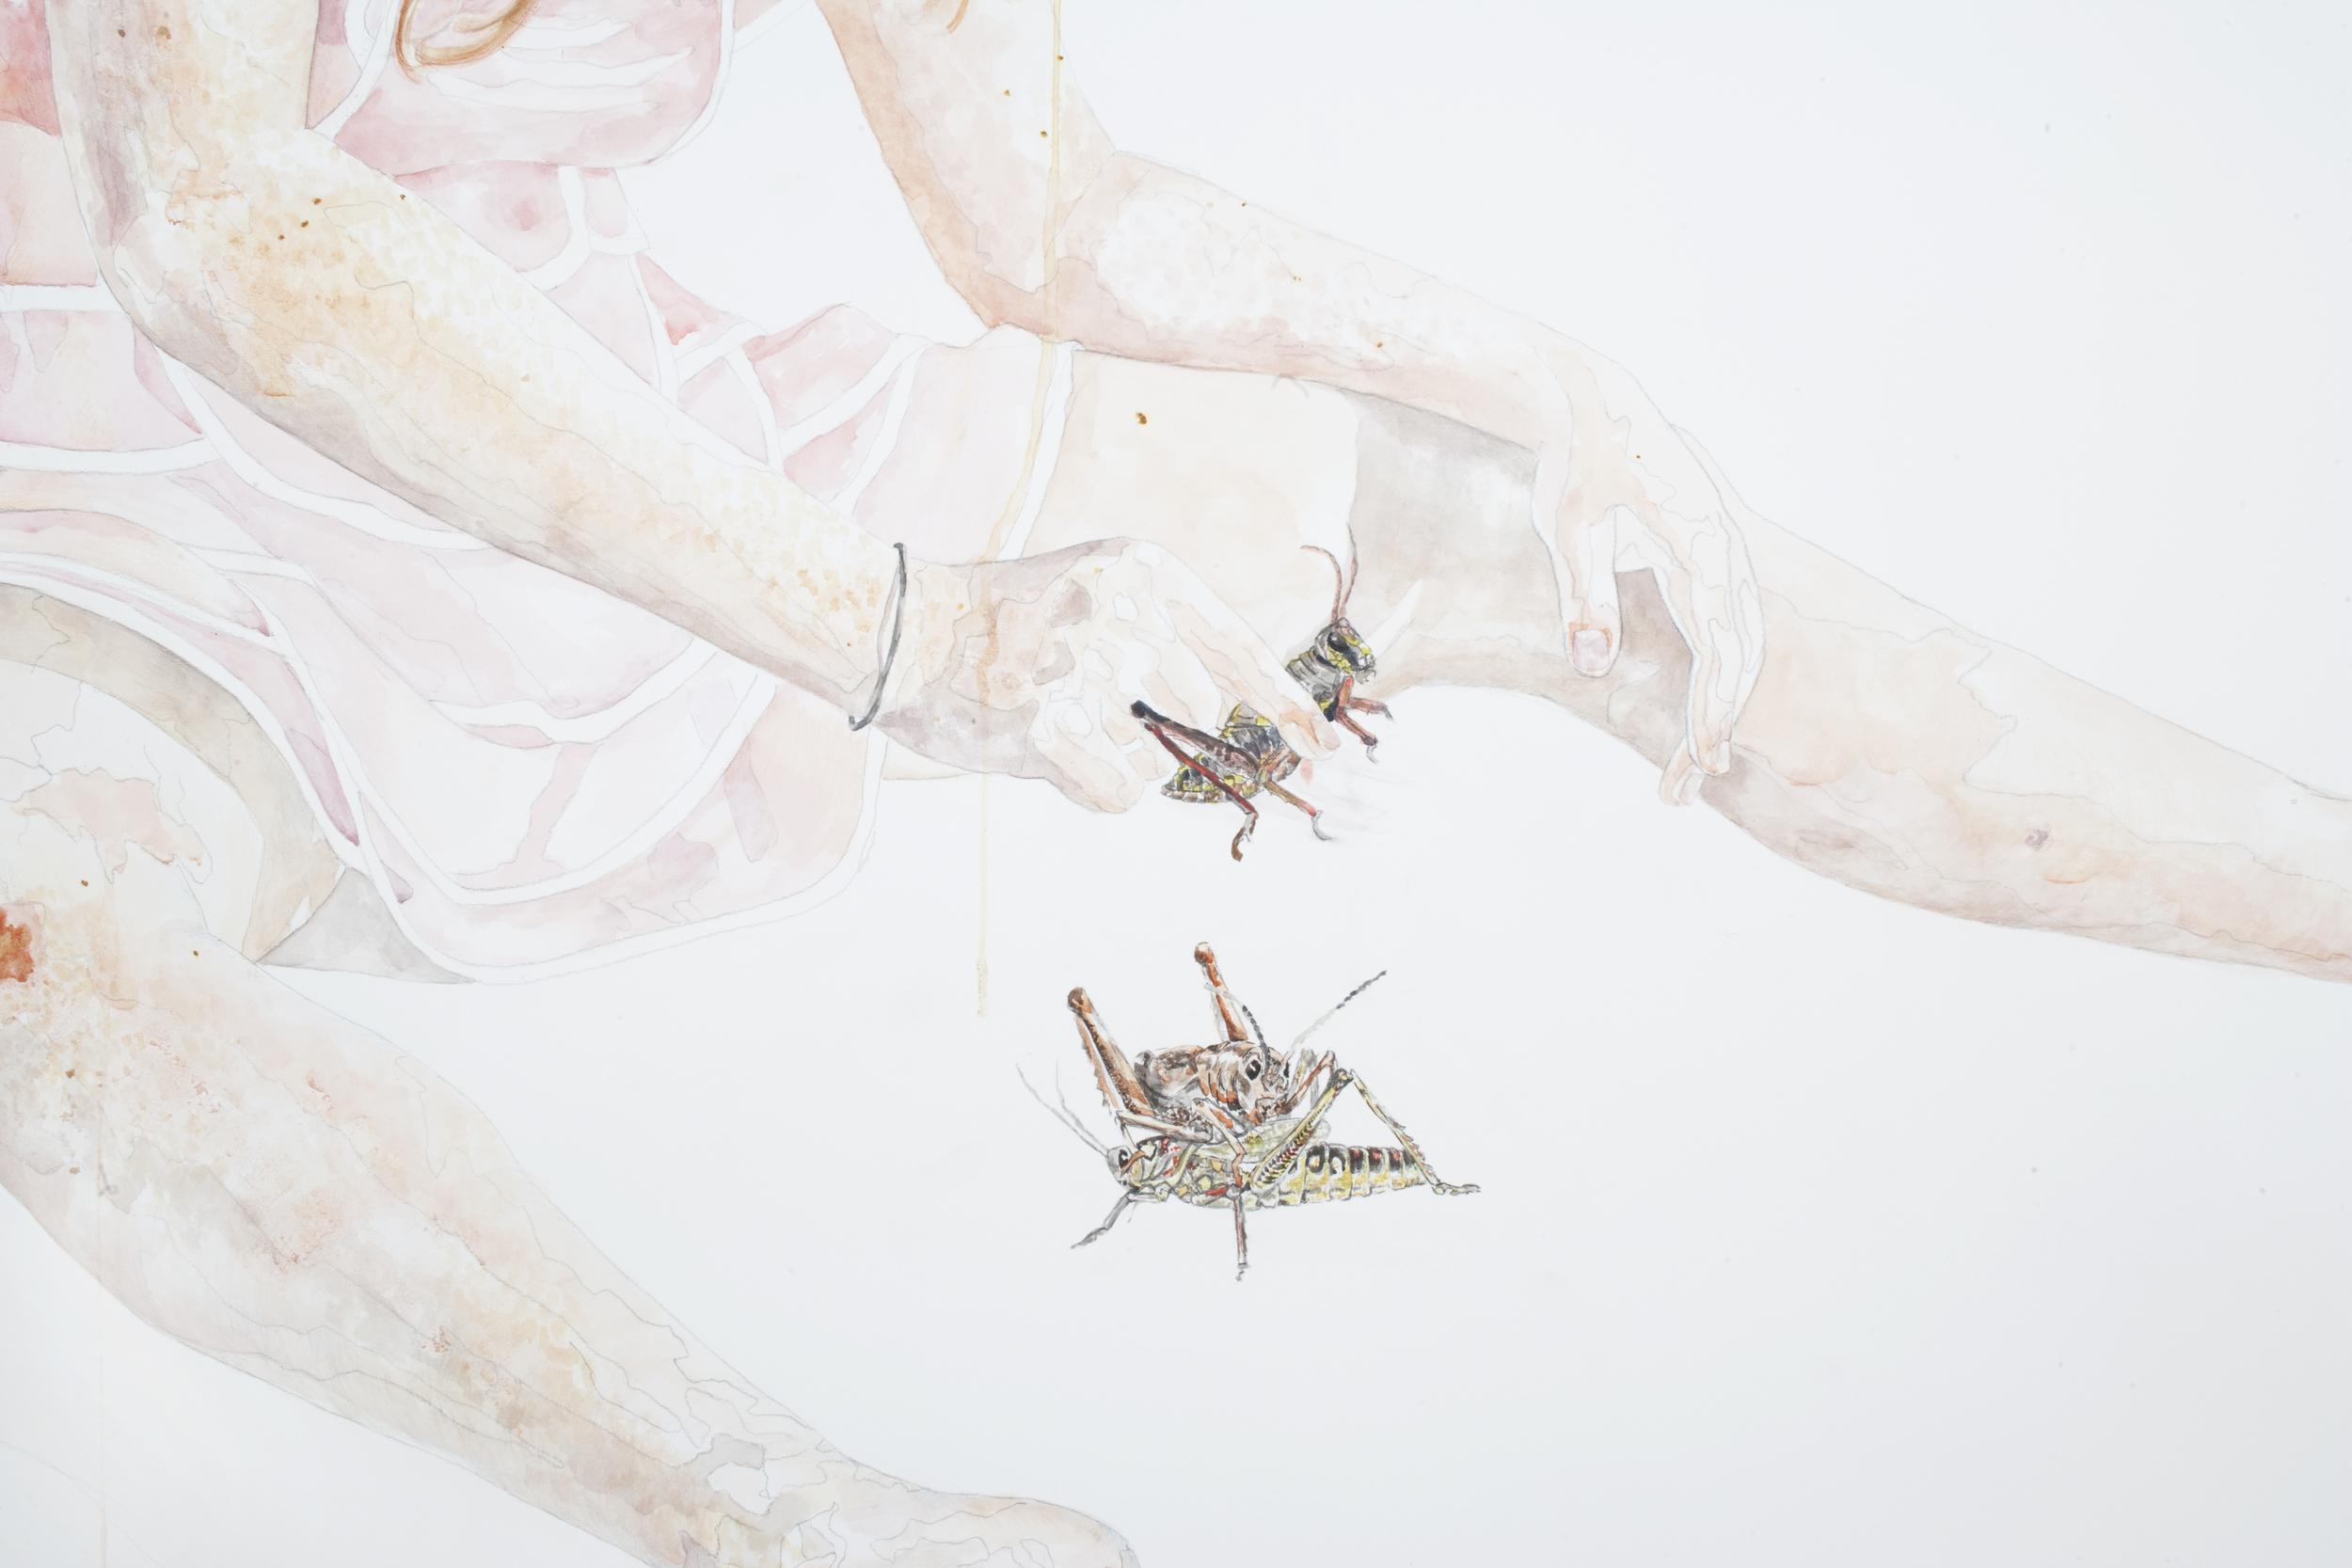 HD Grasshopper detail 1.jpg